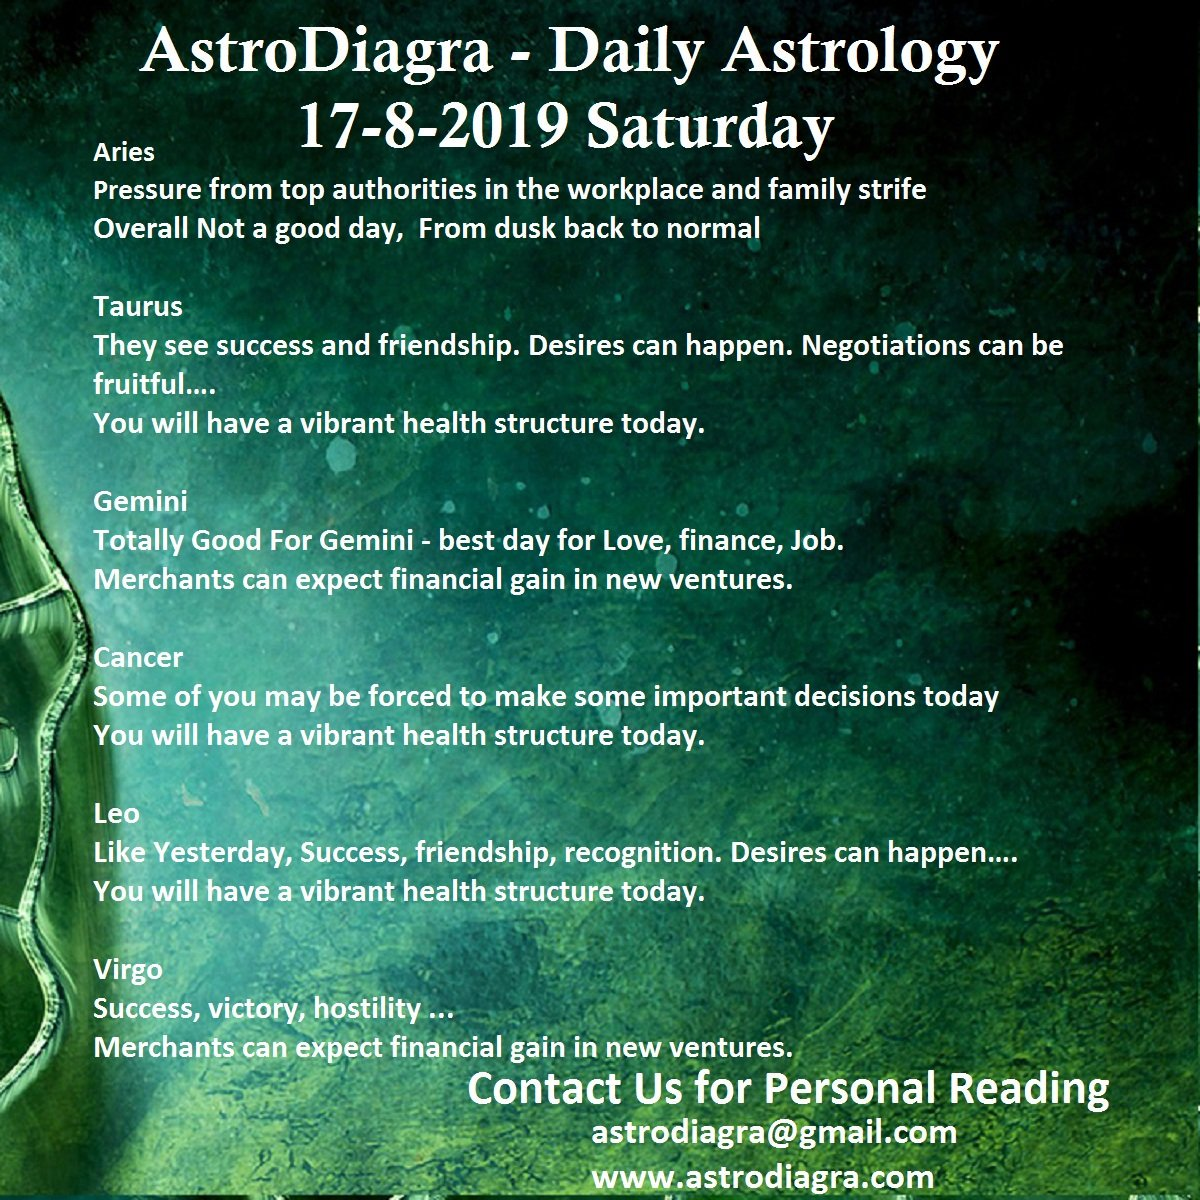 astrodiagra - AstroDiagra - Indian Vedic Astrology